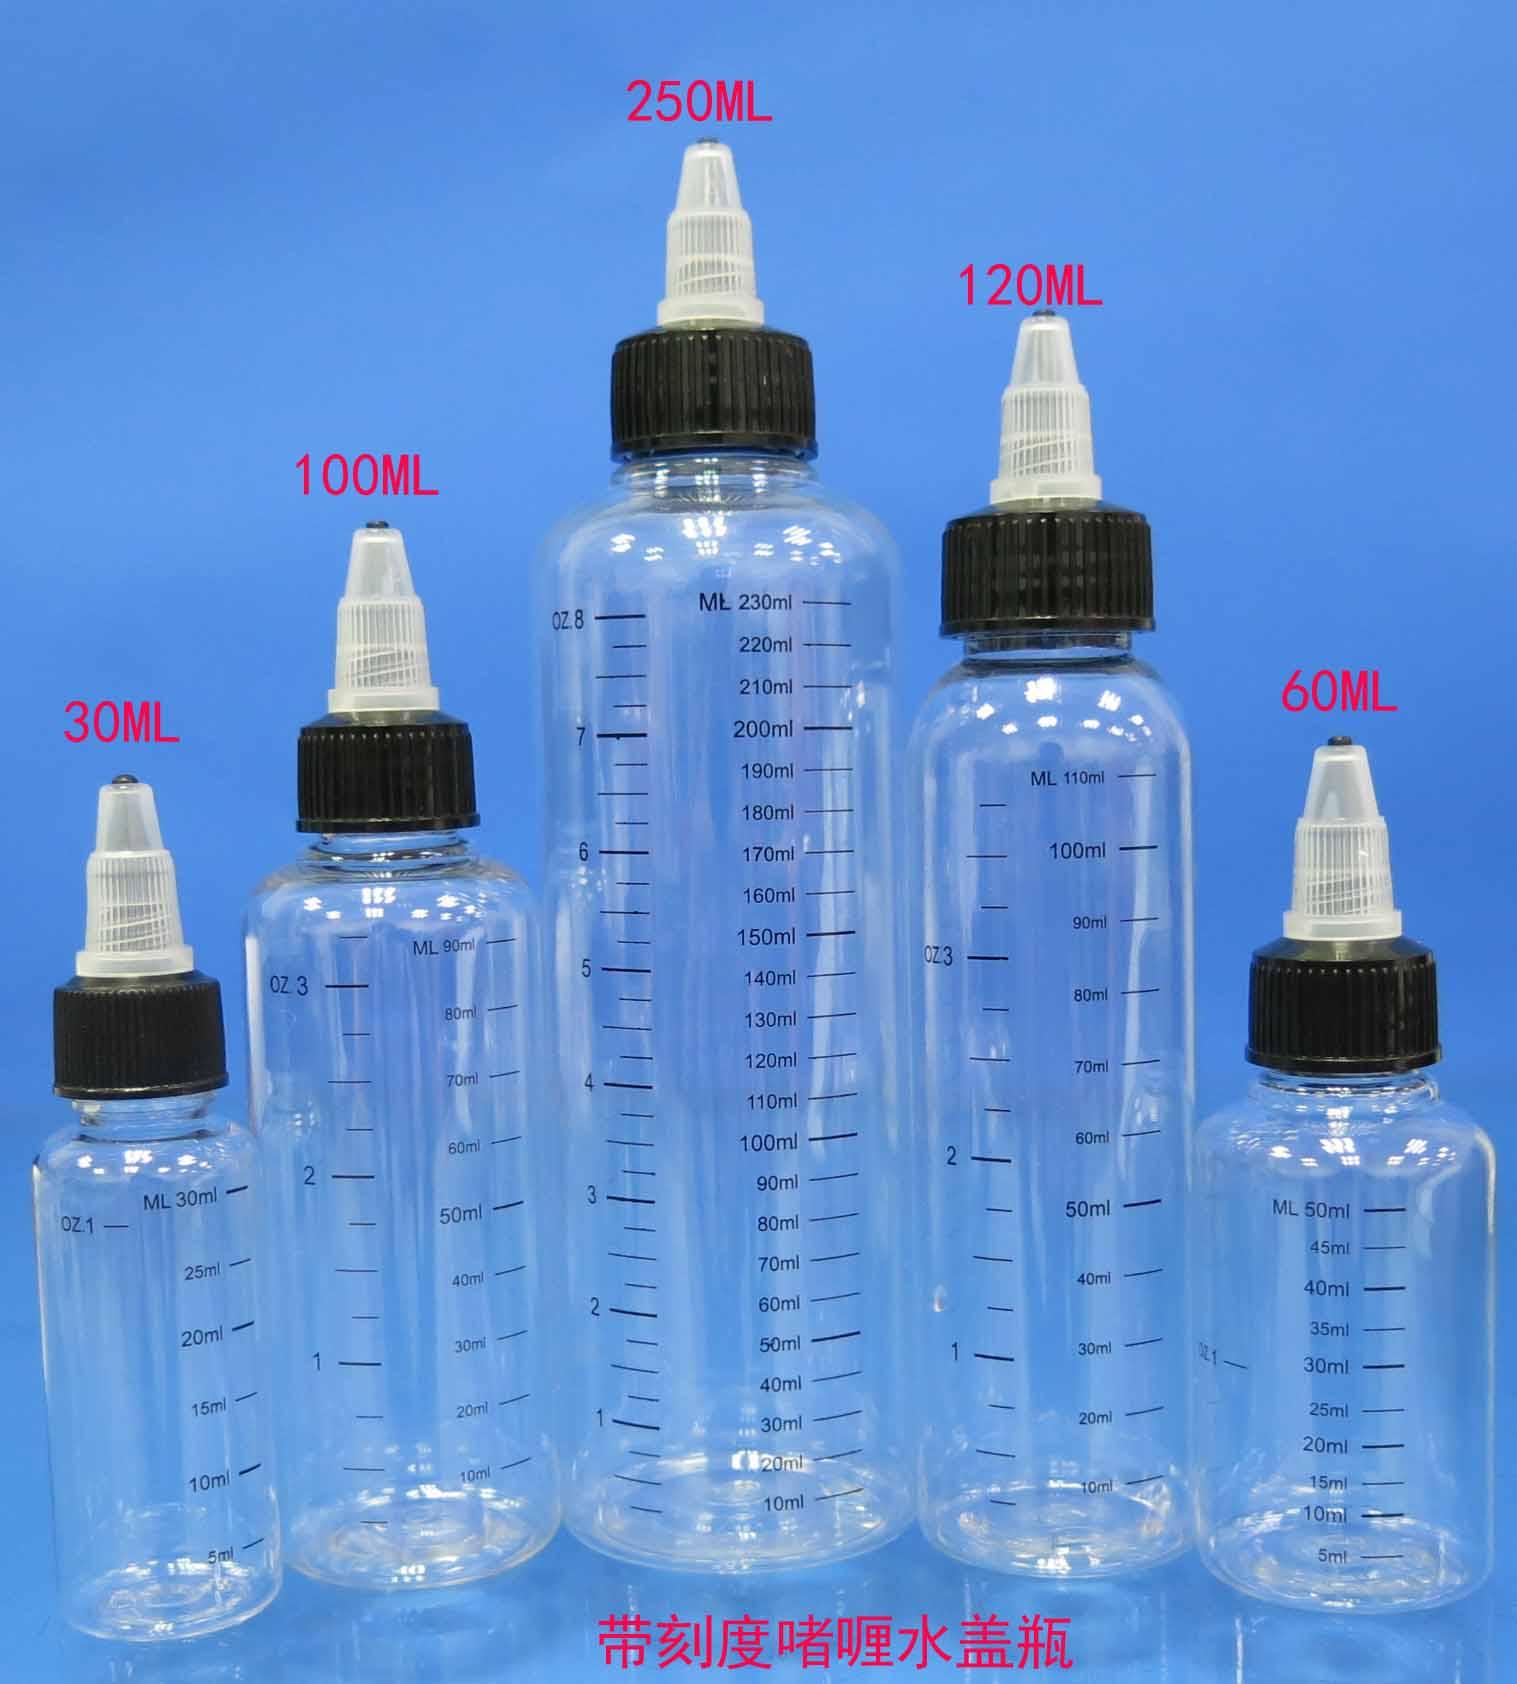 10pcs 30ml/60ml/100ml/120ml/250ml Plastic PET E Juice Liquid Dropper Capacity Bottle Twist Top Cap Bottle For Tattoo Pigment Ink